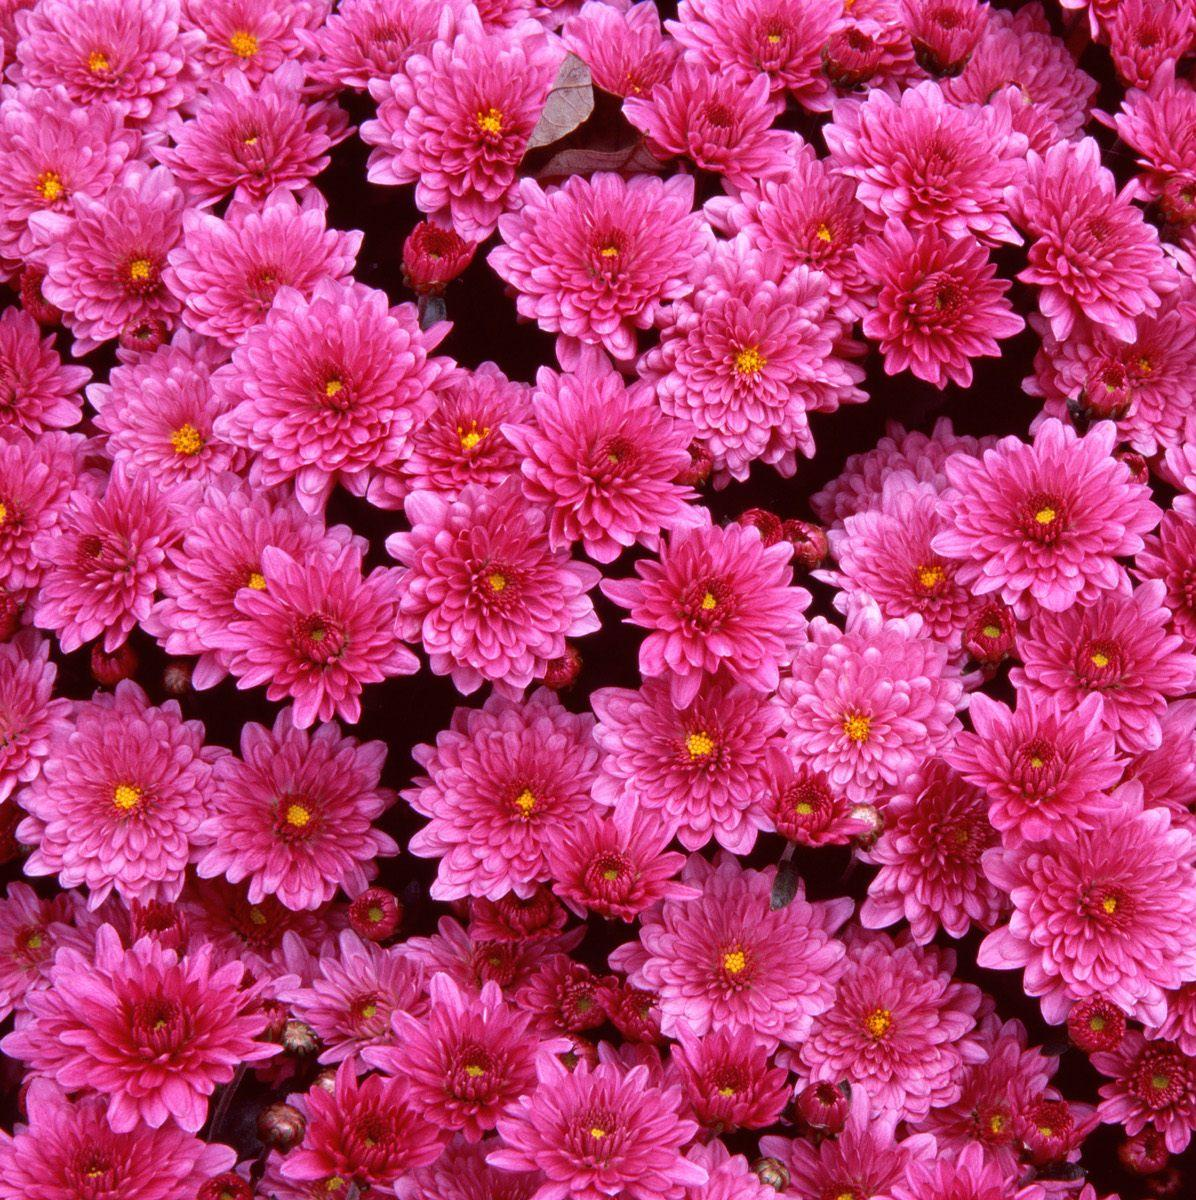 Beautiful Flower For Wallpaper: Download Wallpapers Free: Beautiful Flowers Wallpaper